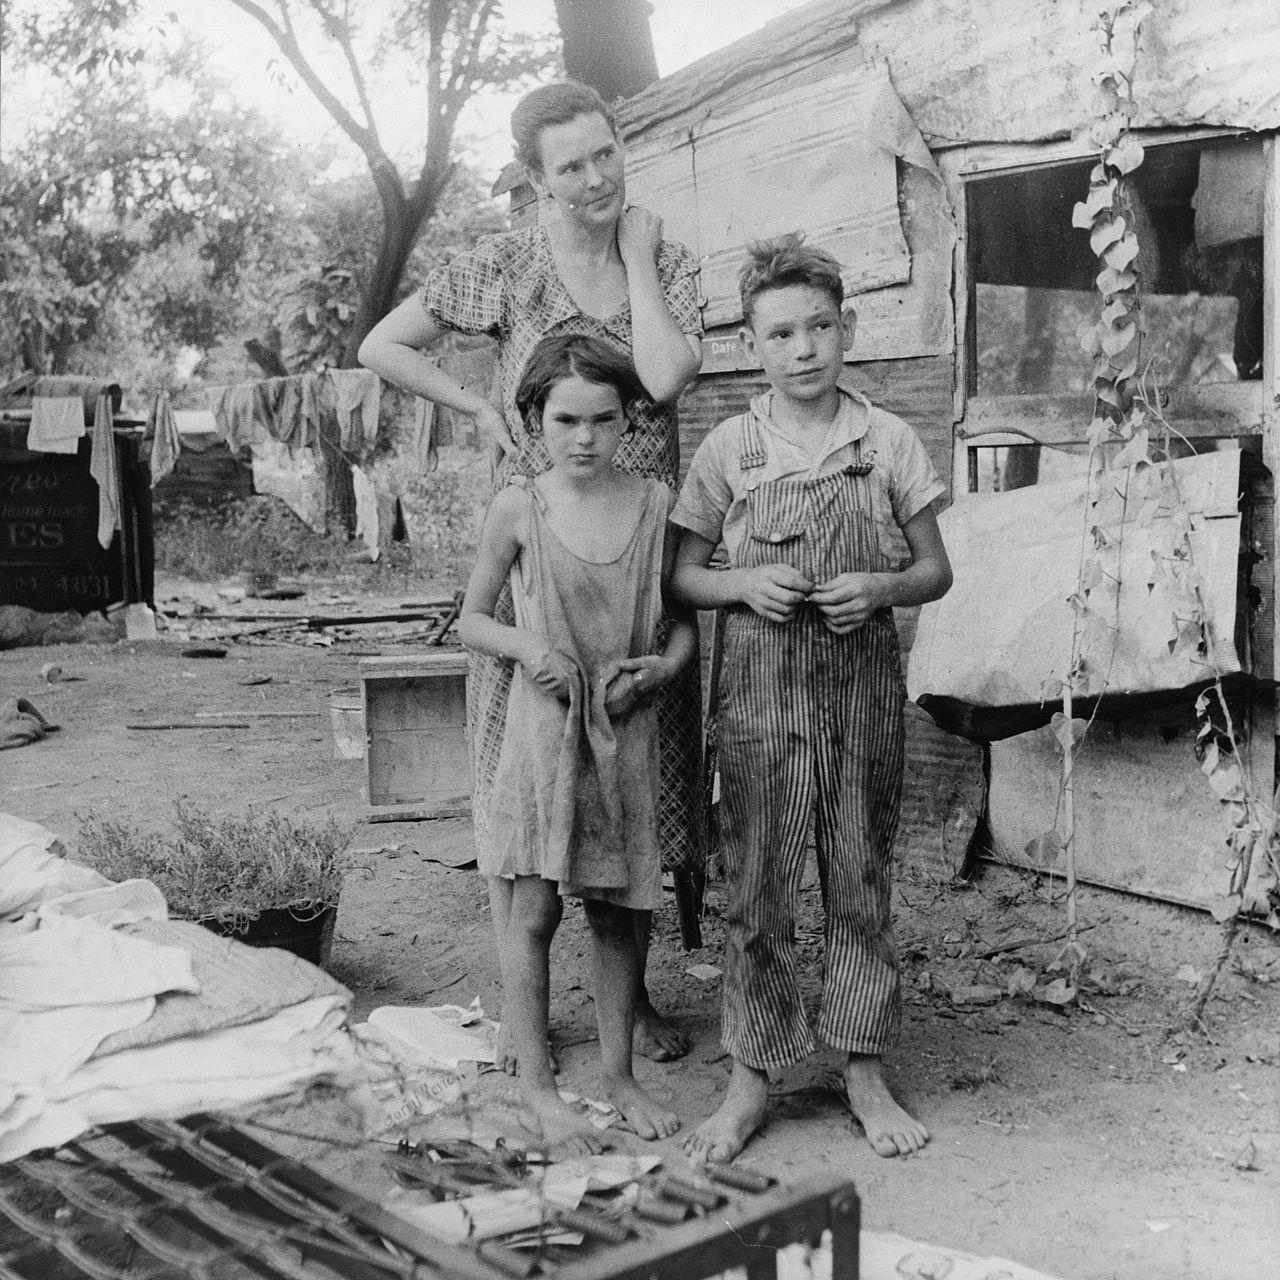 Foto keluarga miskin di masa Great Depression 1936 di Oklahoma, AS    Dorothea Lange Wikimedia Commons